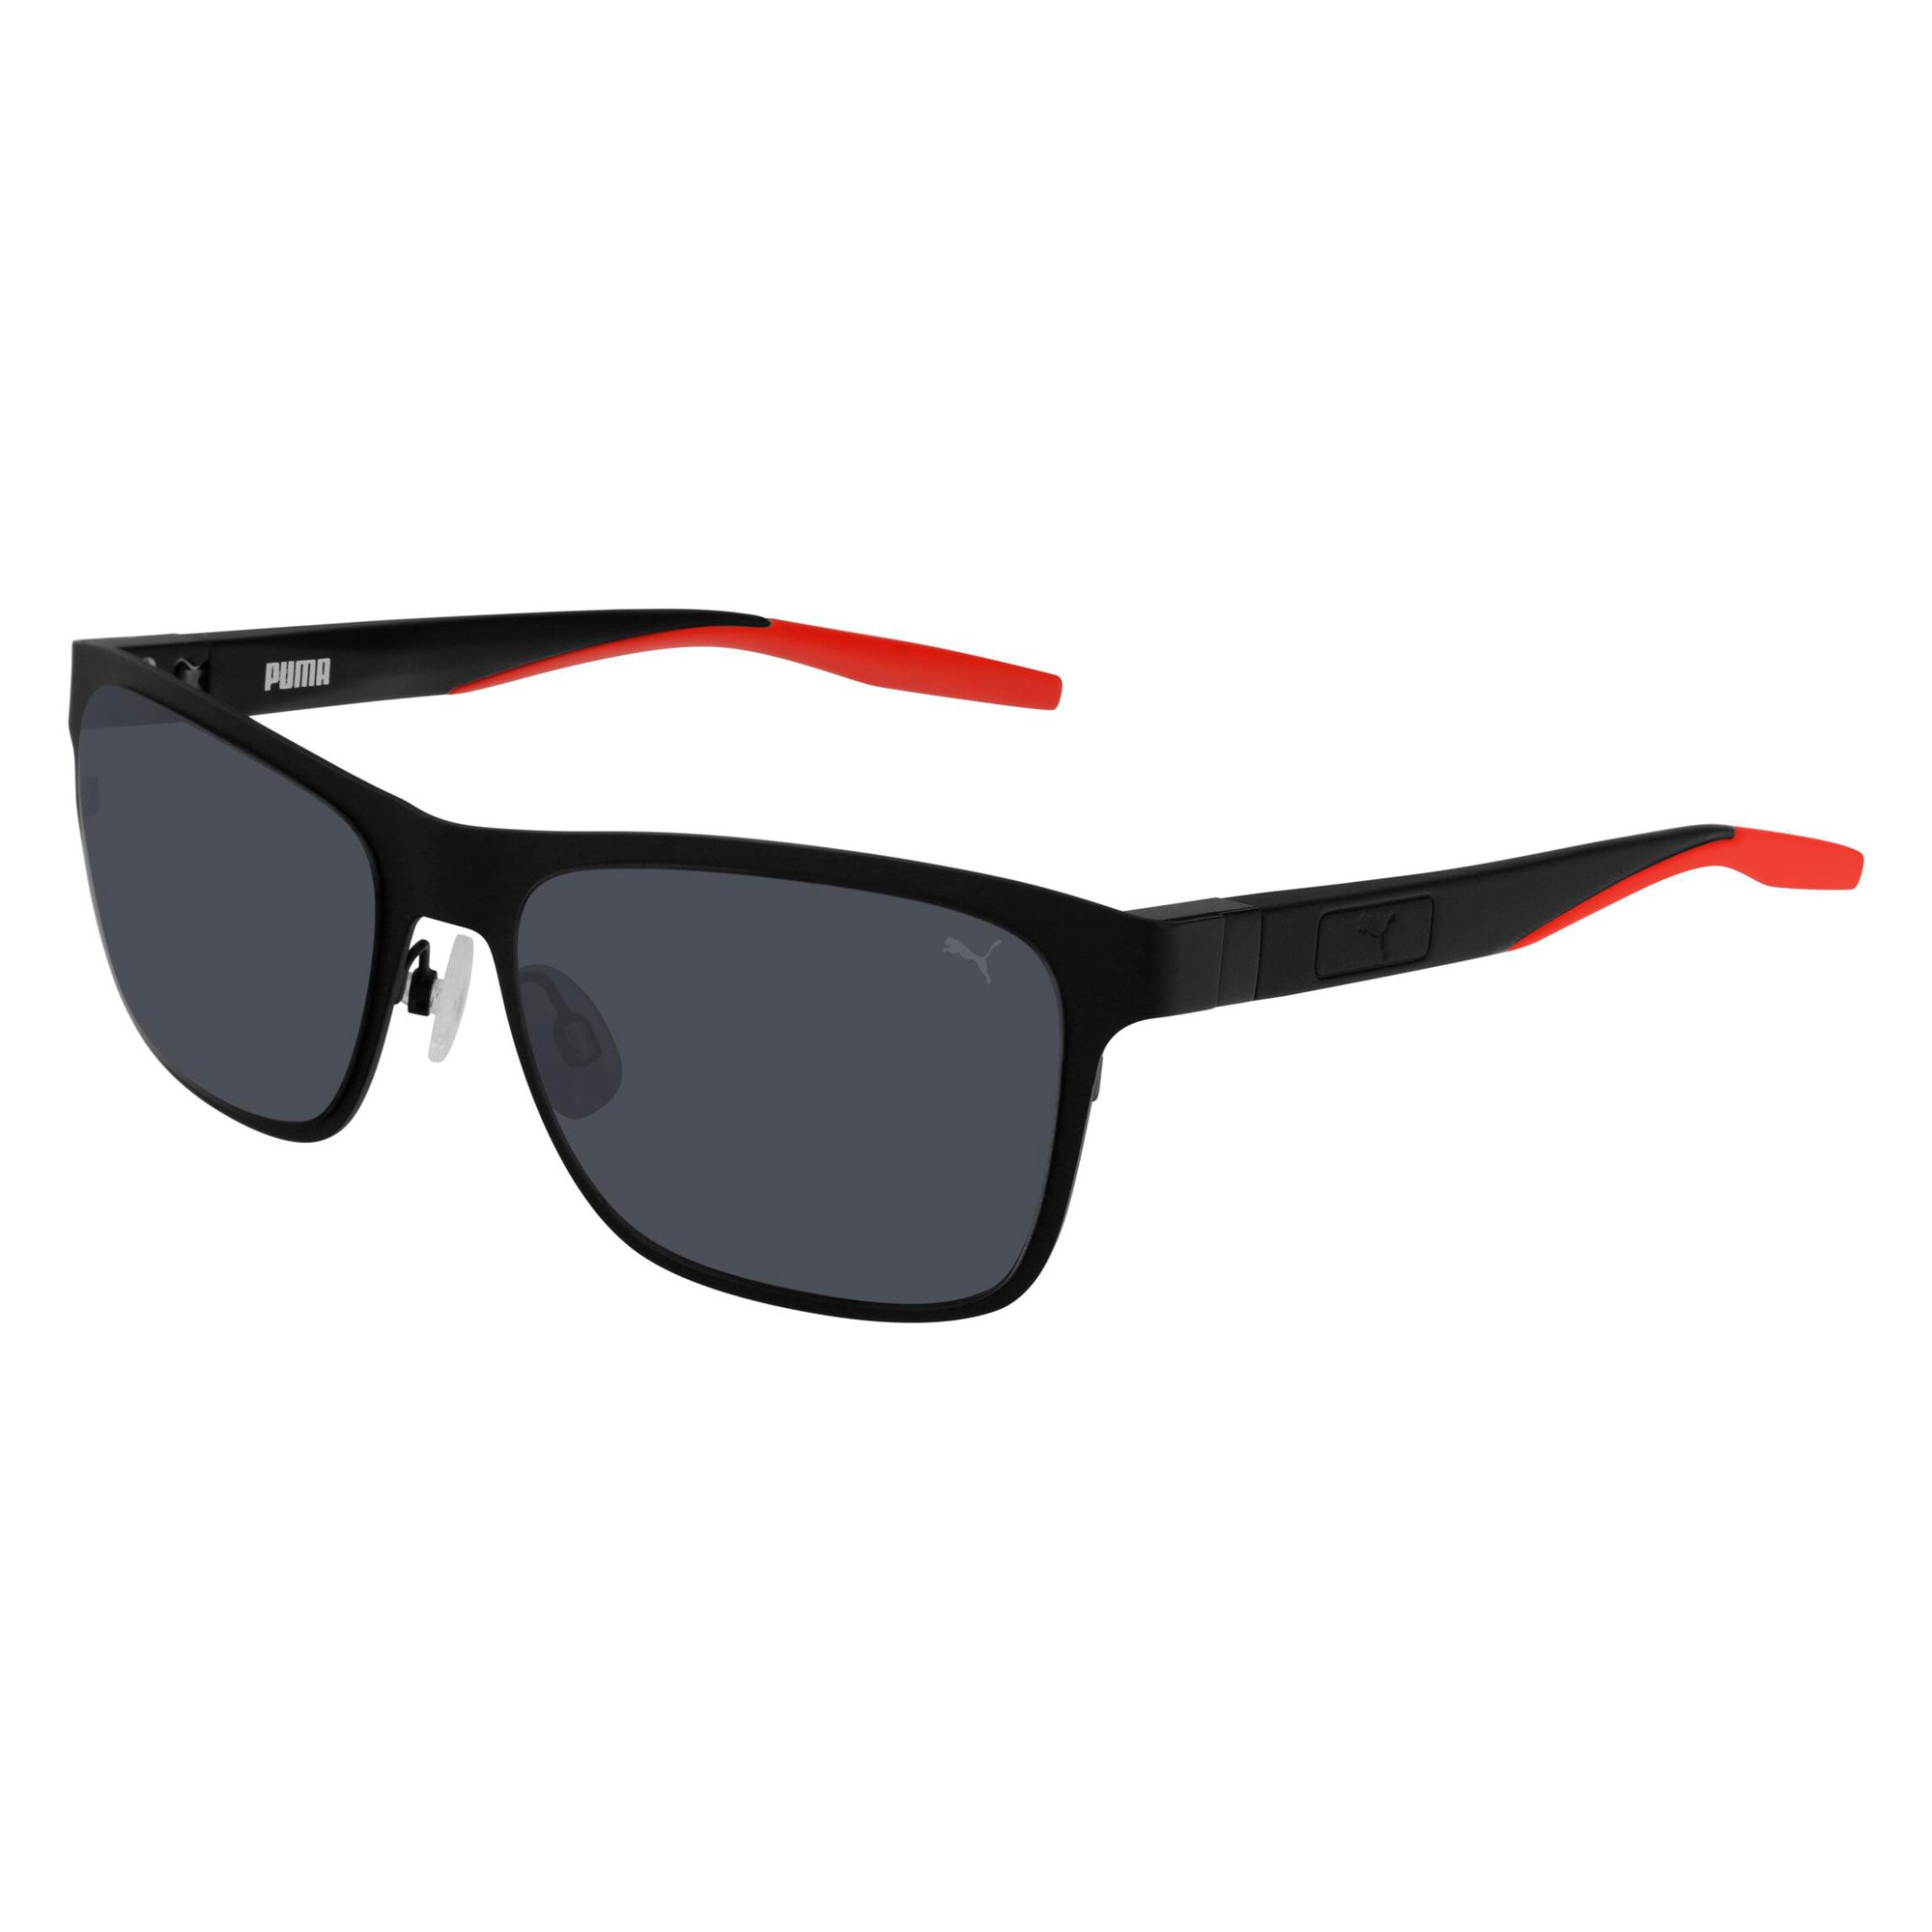 Miniatura 1 de Gafas de sol rectangularesStrand, NEGRO, mediano